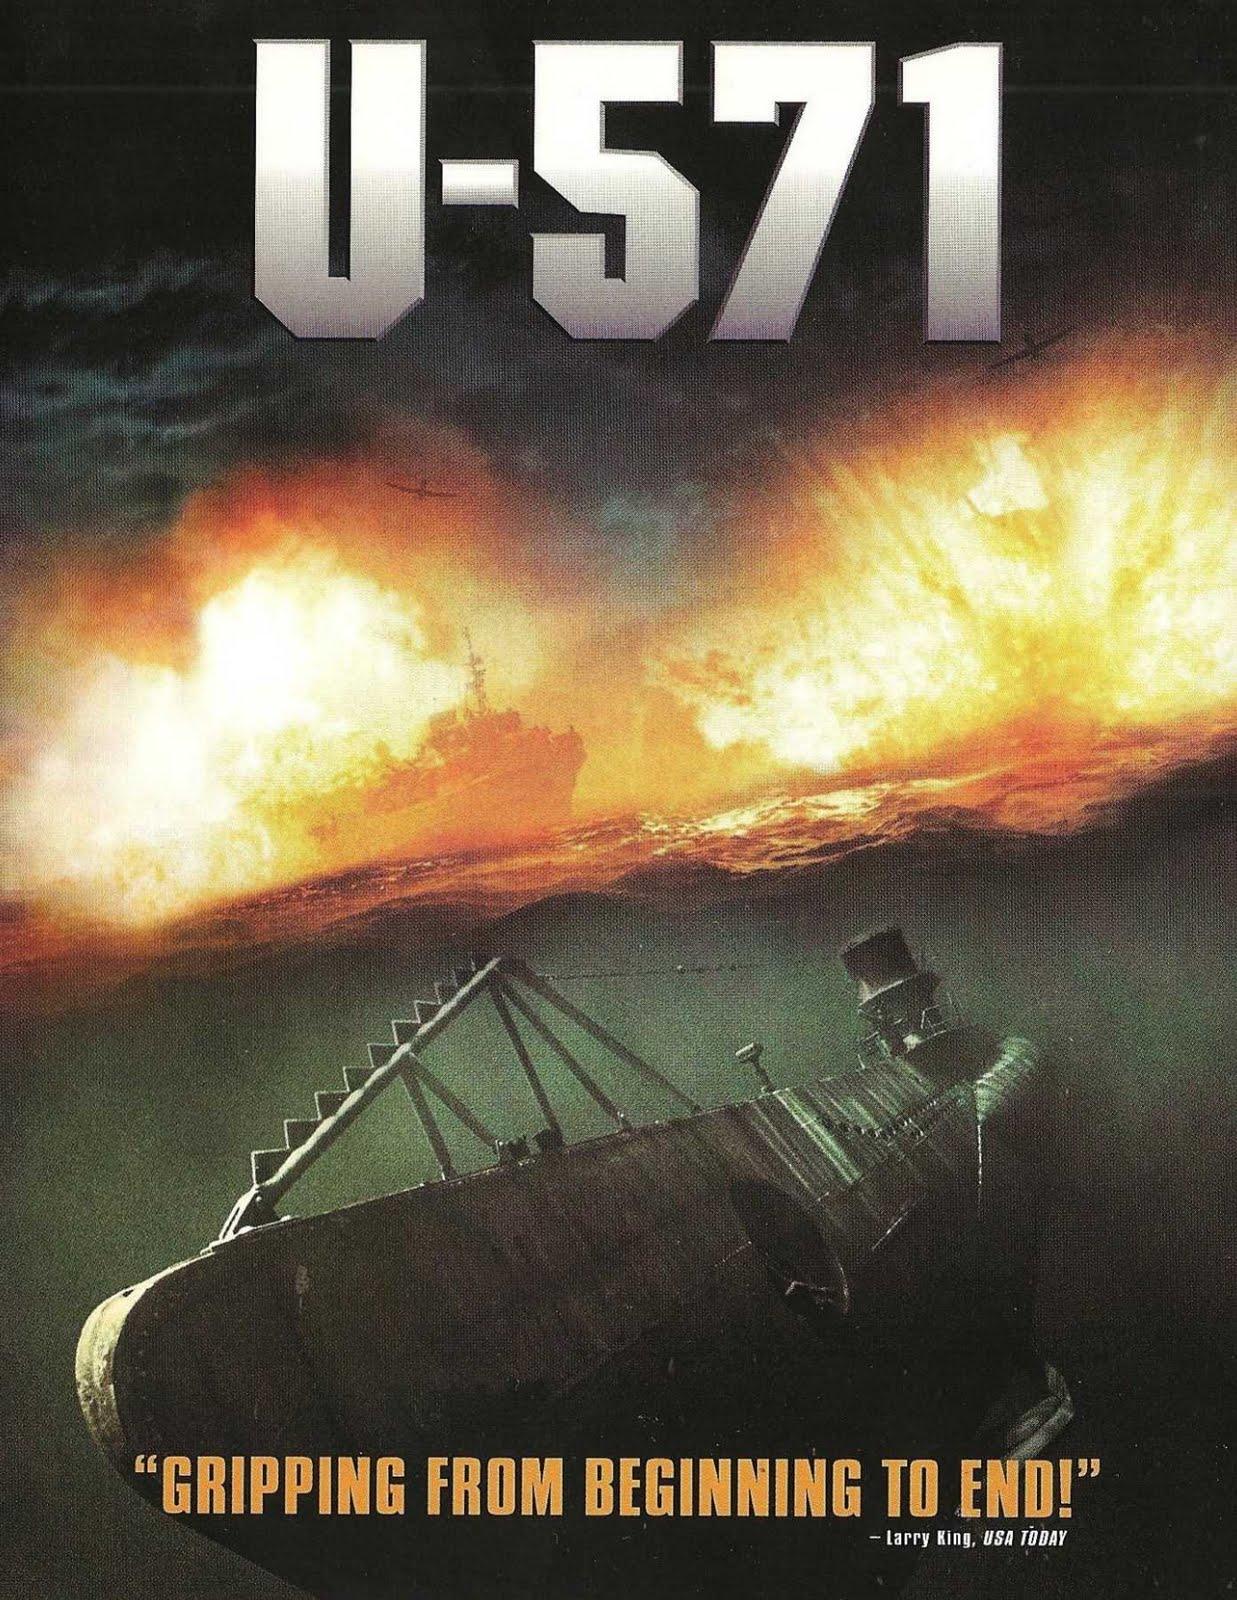 http://4.bp.blogspot.com/_bQY56Uy2fEg/TNae2OC3PzI/AAAAAAAAEbA/uRqP0kb_wvI/s1600/Ponorka+U-571+DVD+07.jpg